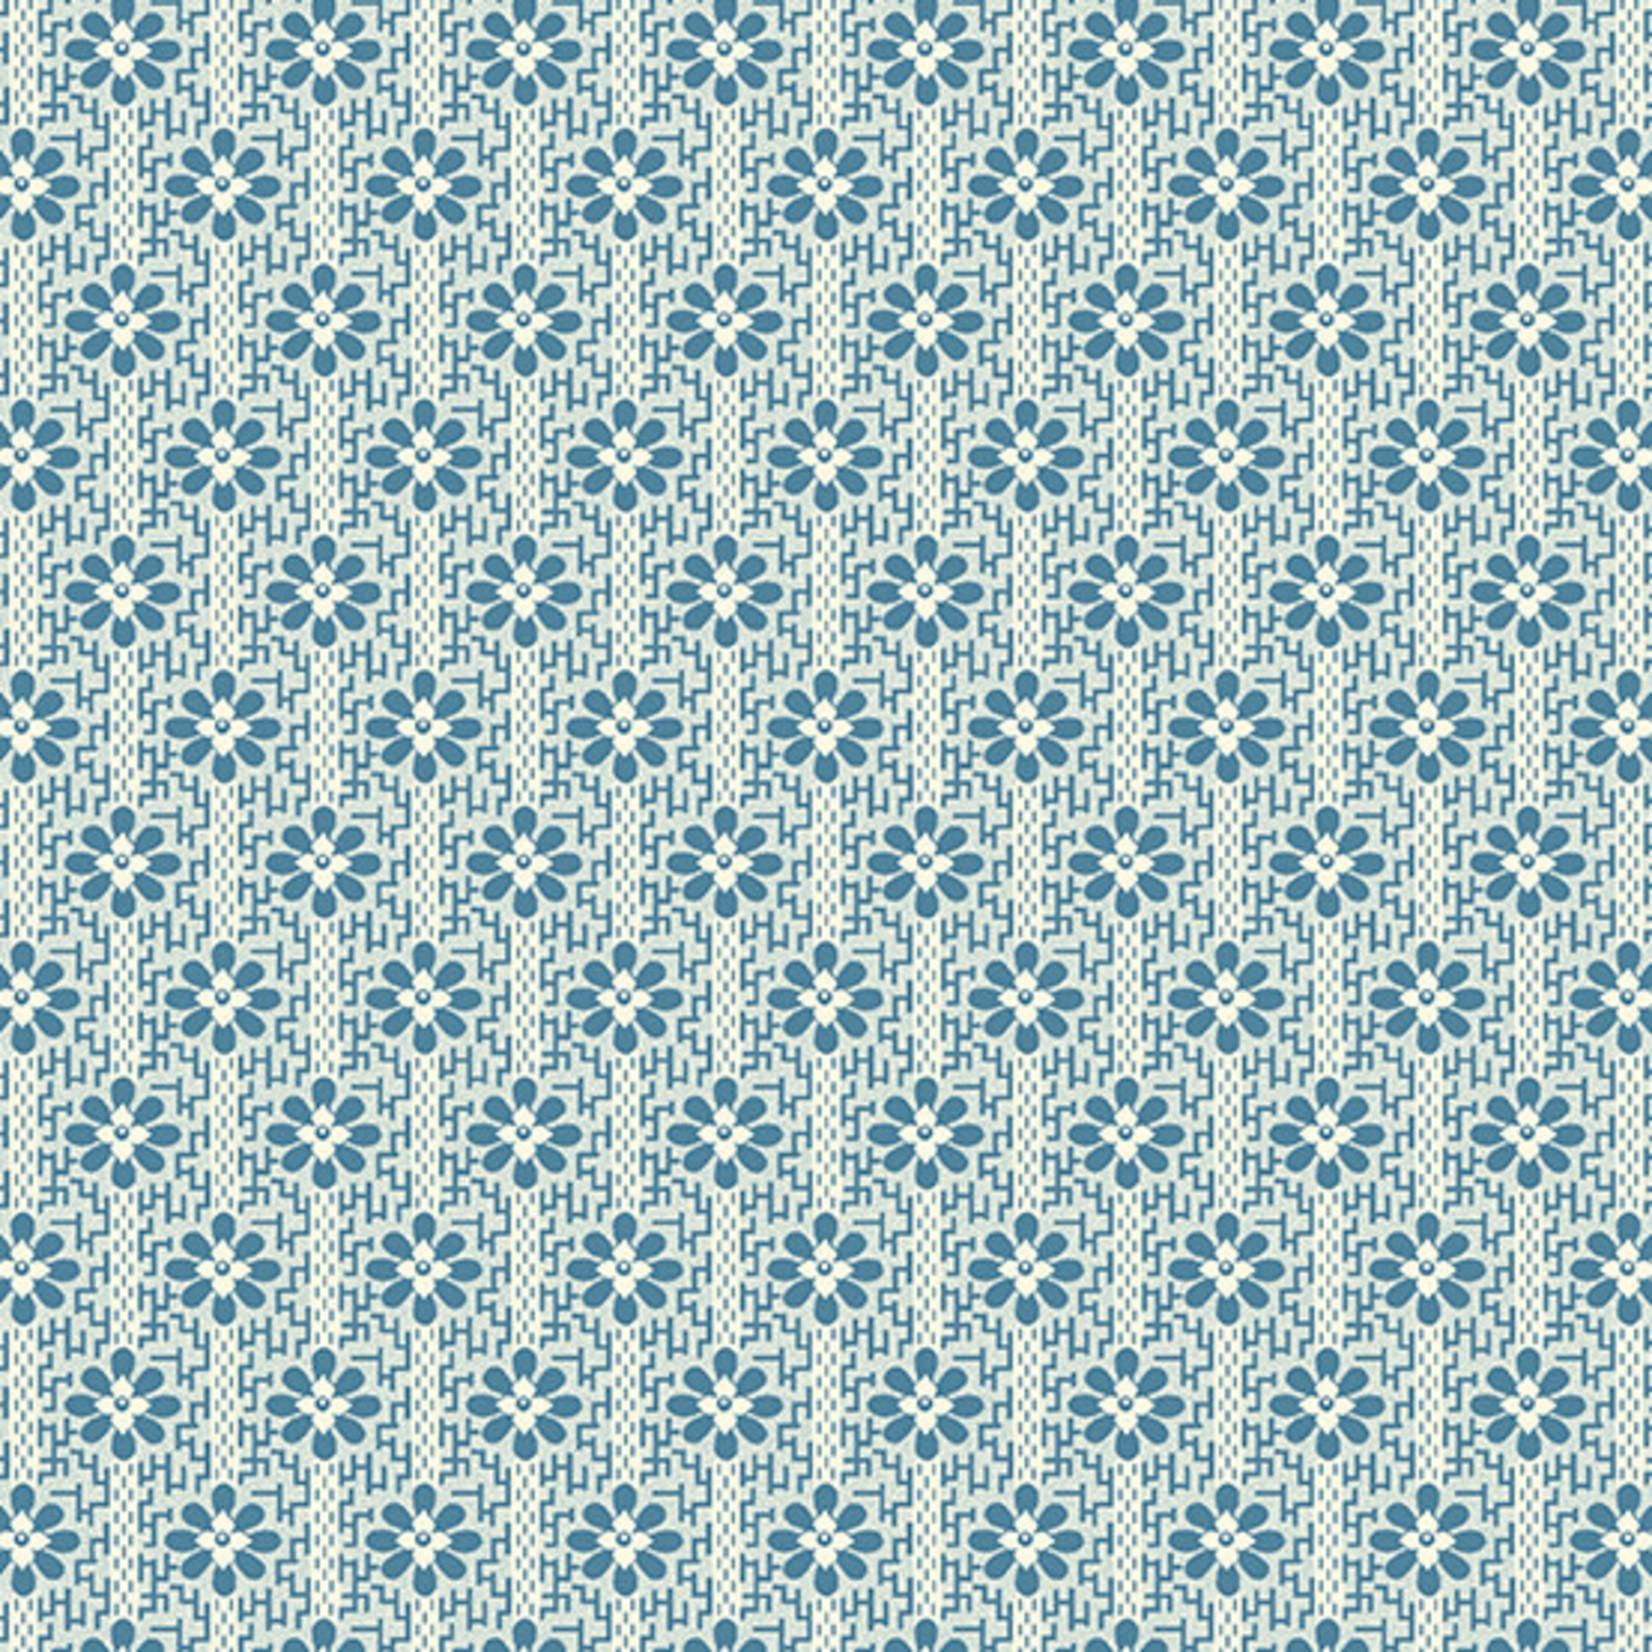 ANDOVER PERFECT UNION, WOVEN, STATE BLUE (A-9588-B) PER CM or $20/m